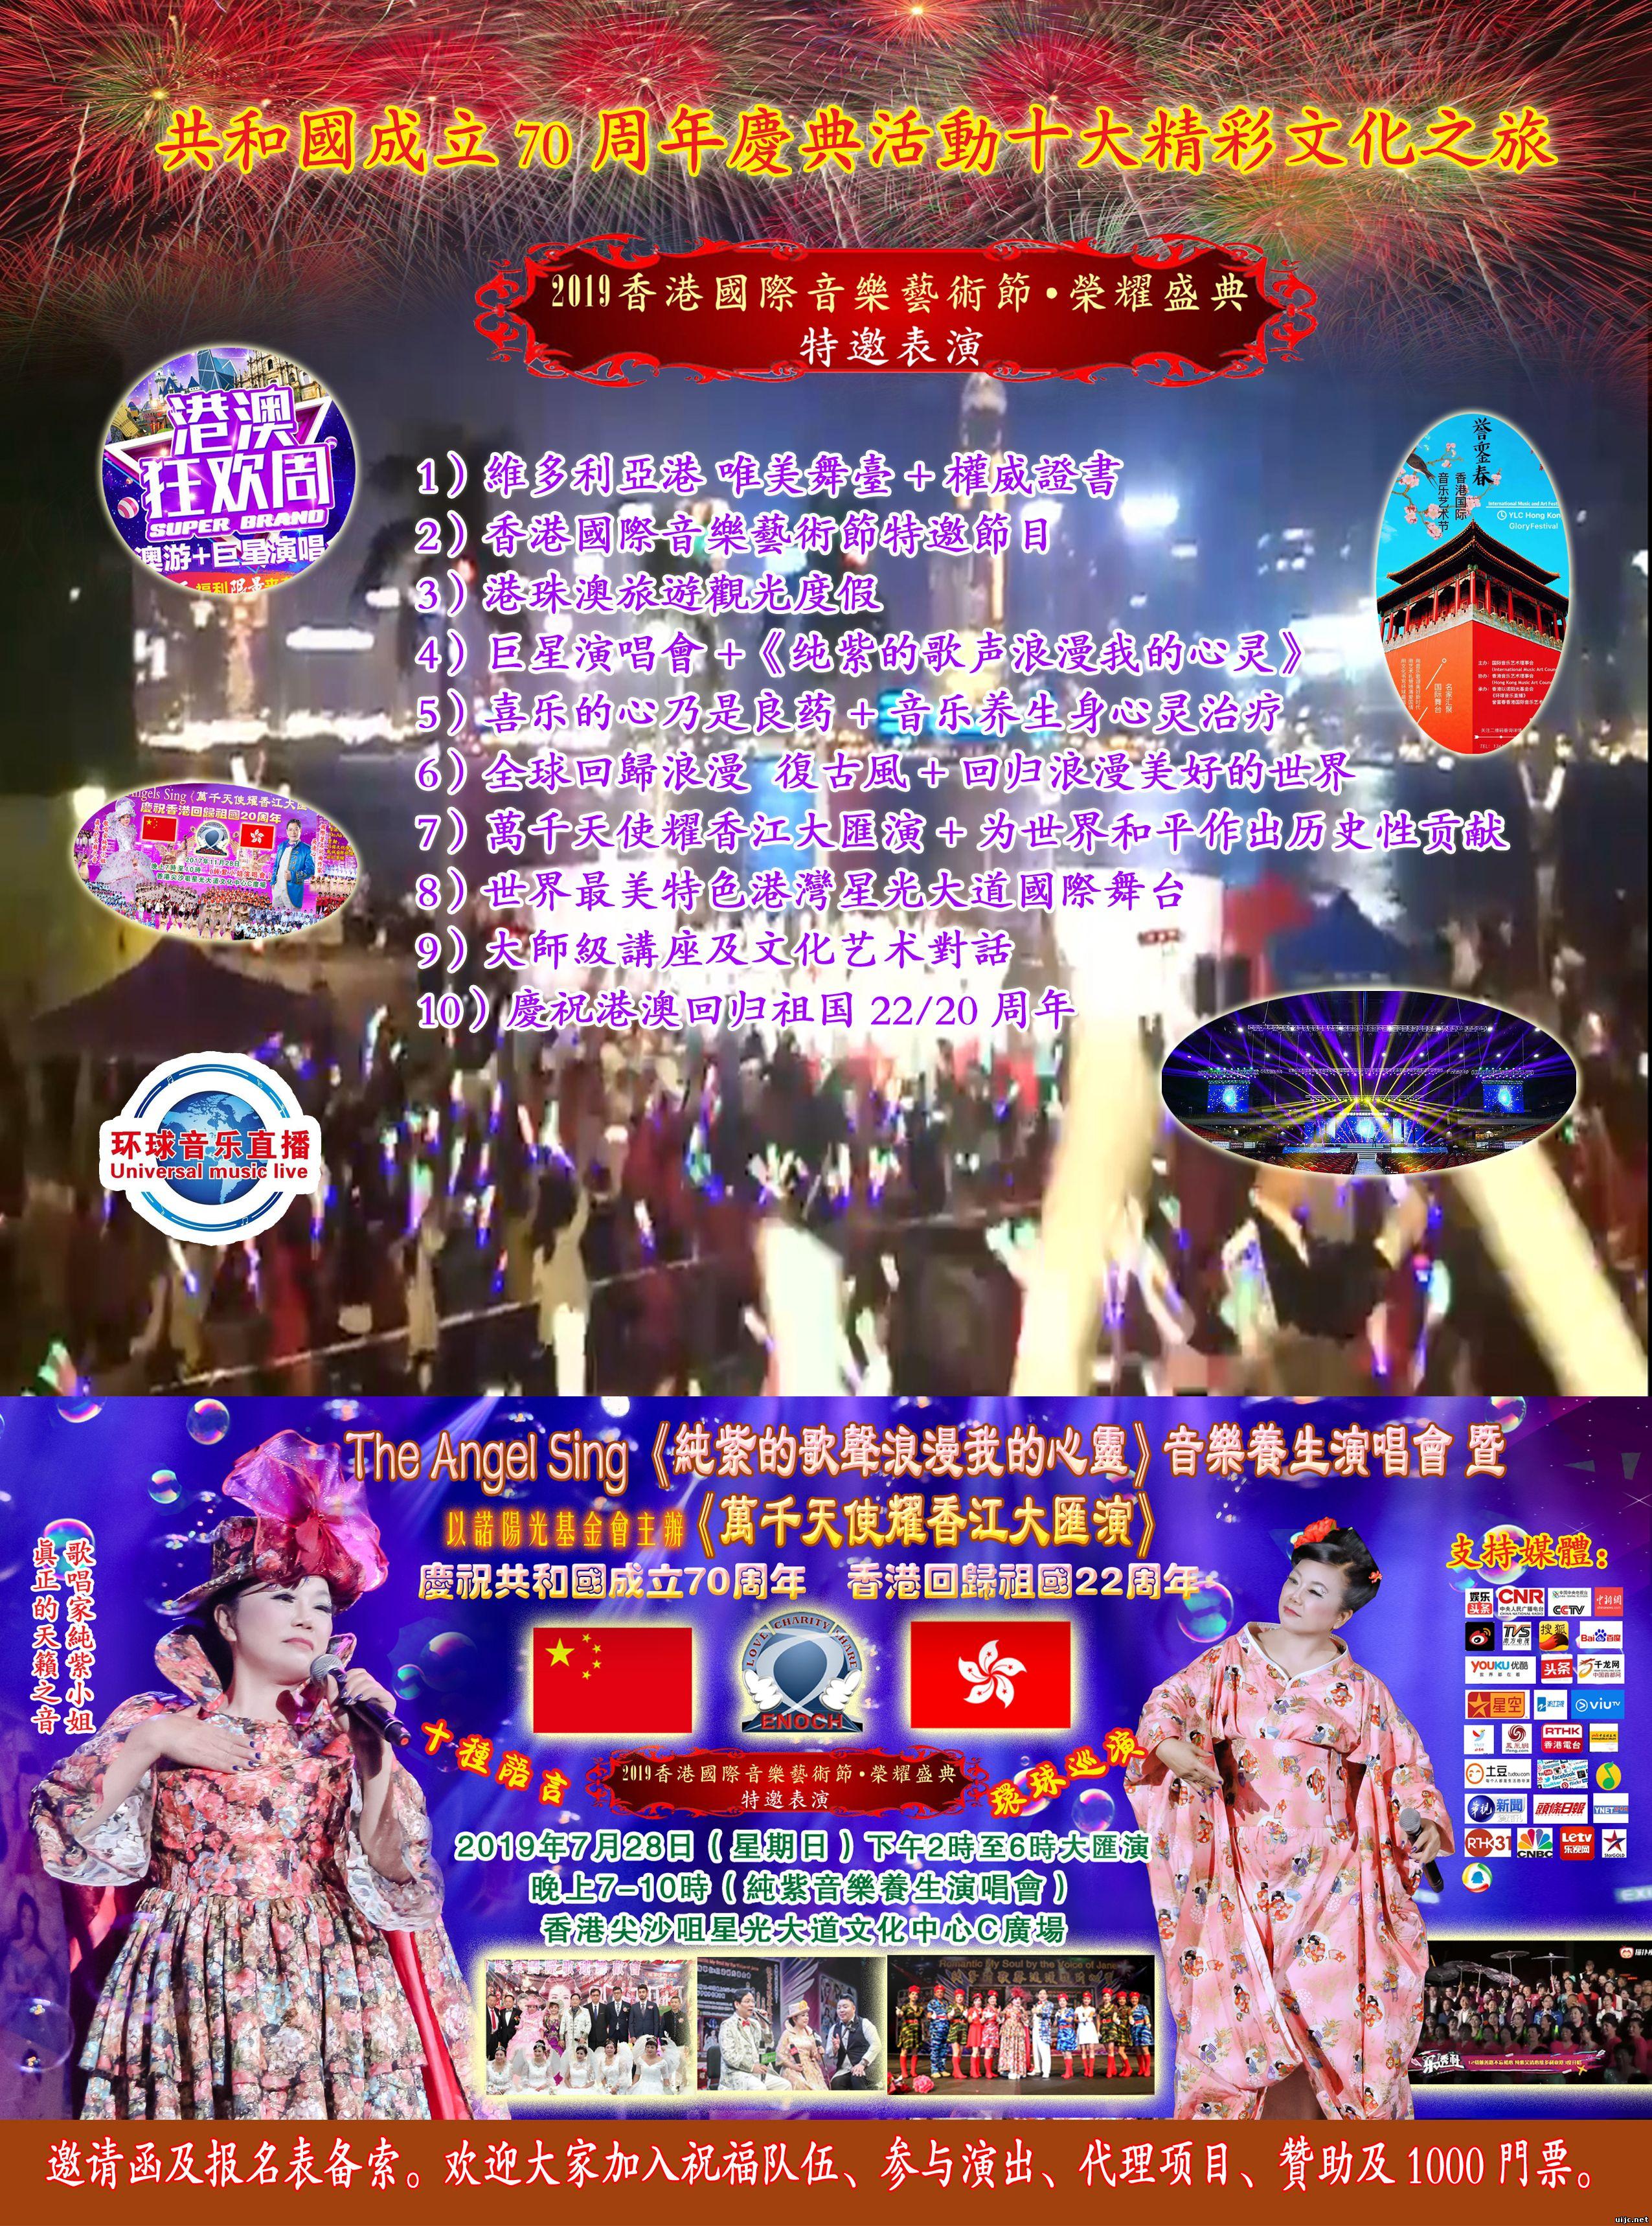 Pic/HongKong190728.jpg